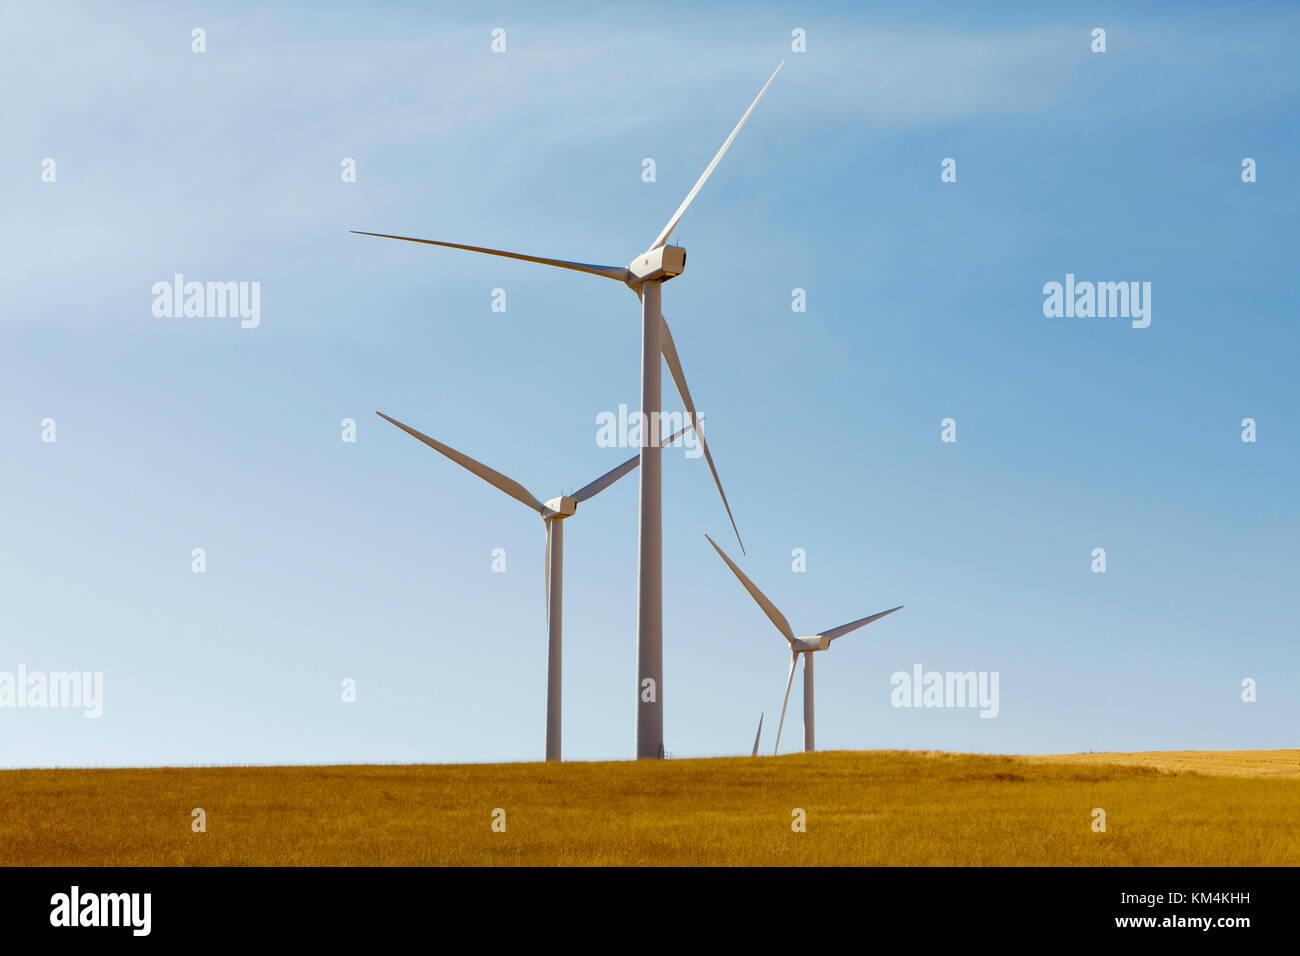 Tall wind turbines in open country farmland in Washington. - Stock Image